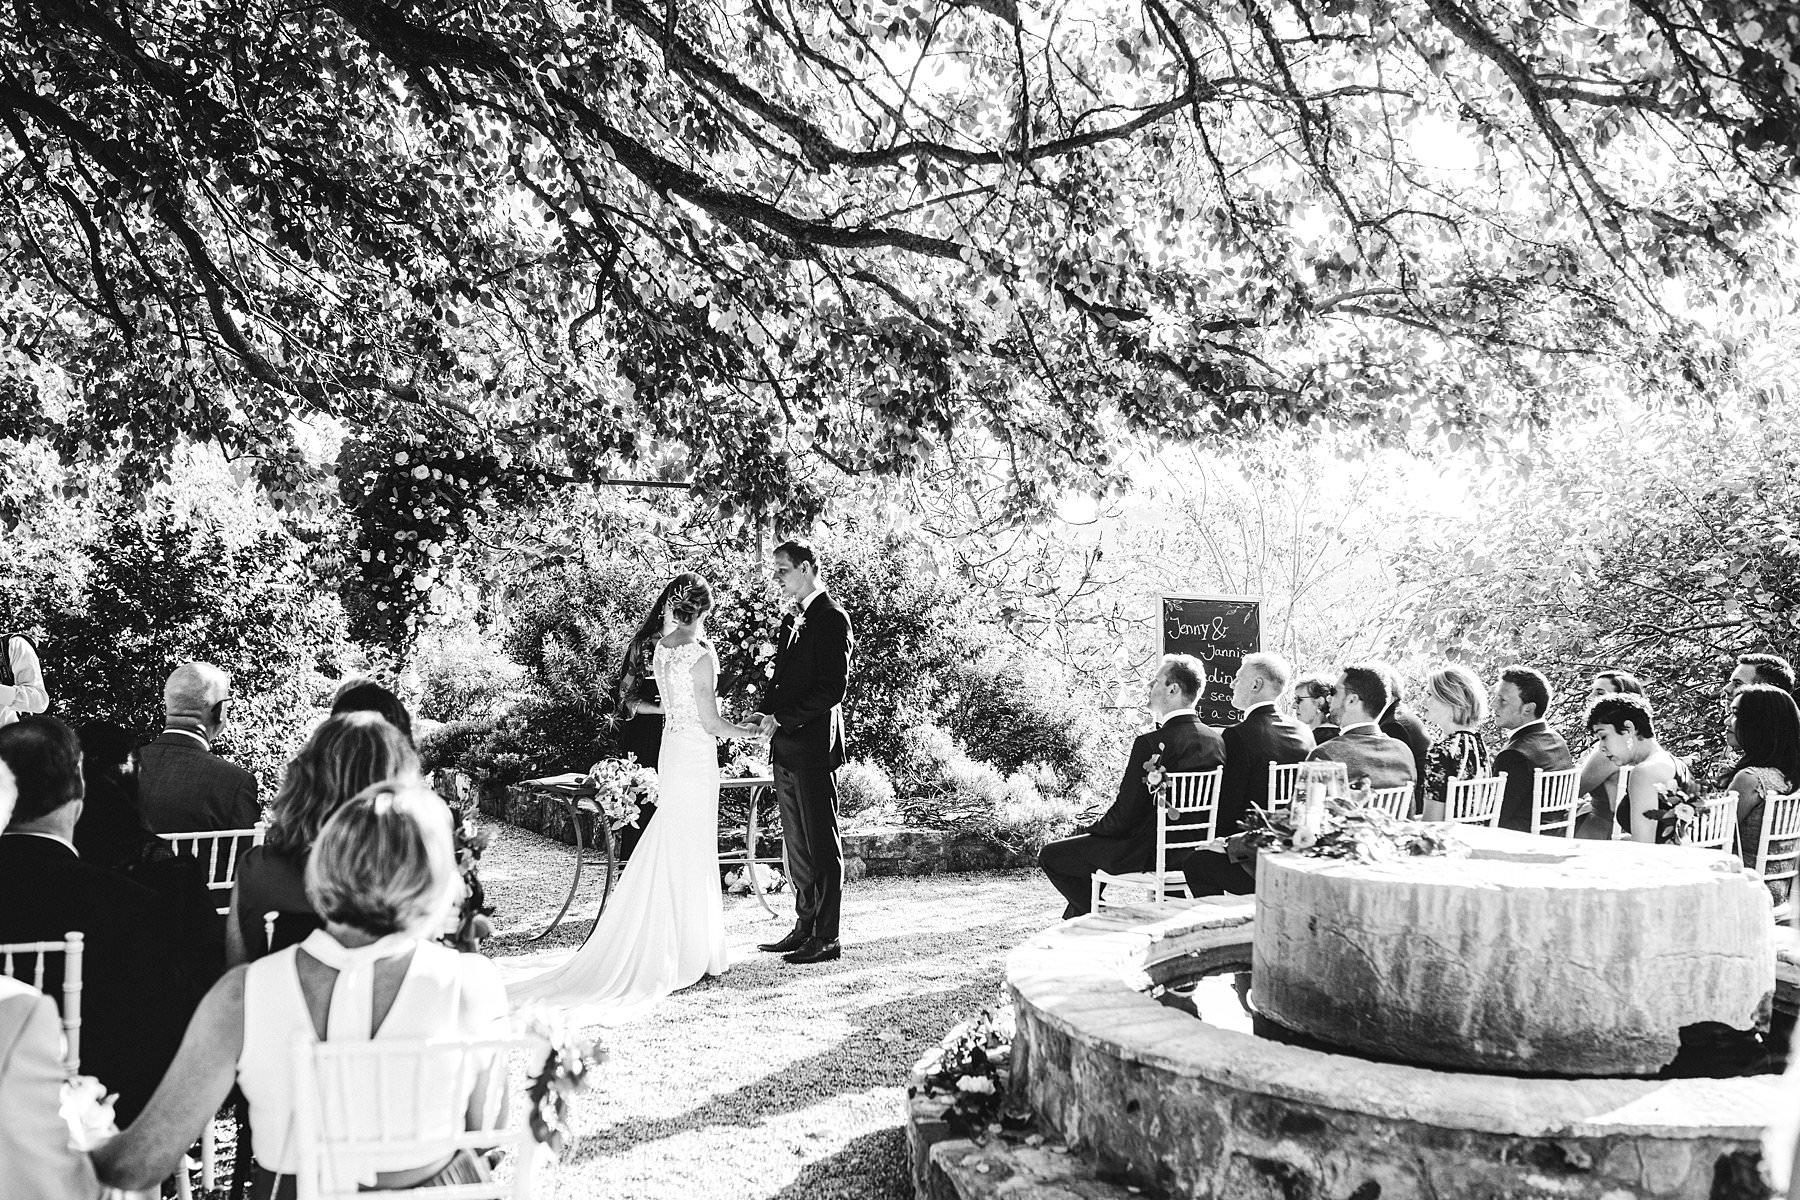 An unforgettable international wedding. Lovely intimate destination wedding ceremony at Villa Monte Solare, Umbria